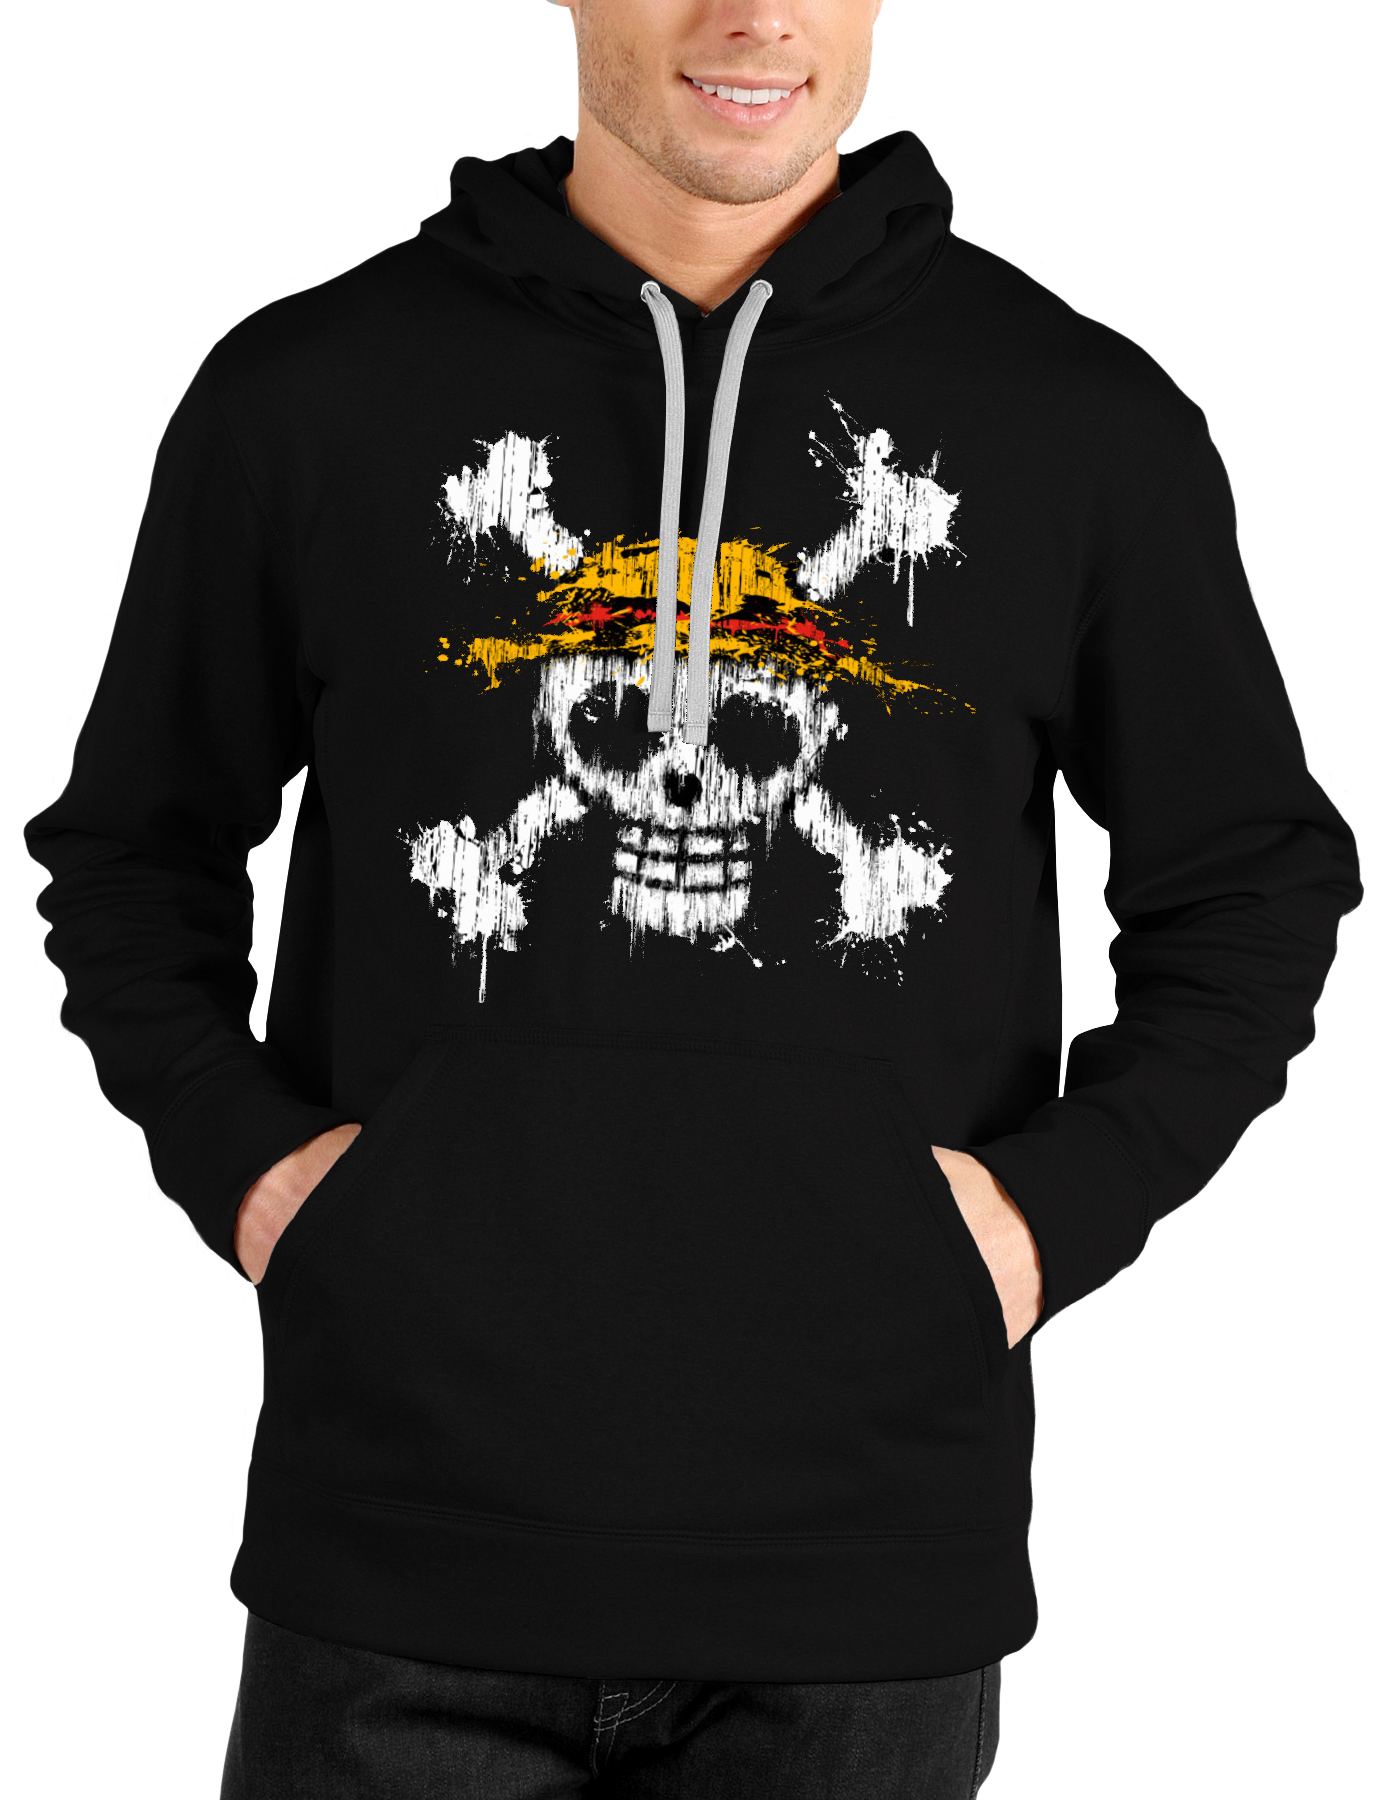 One Piece Black Hoodie - Swag Shirts